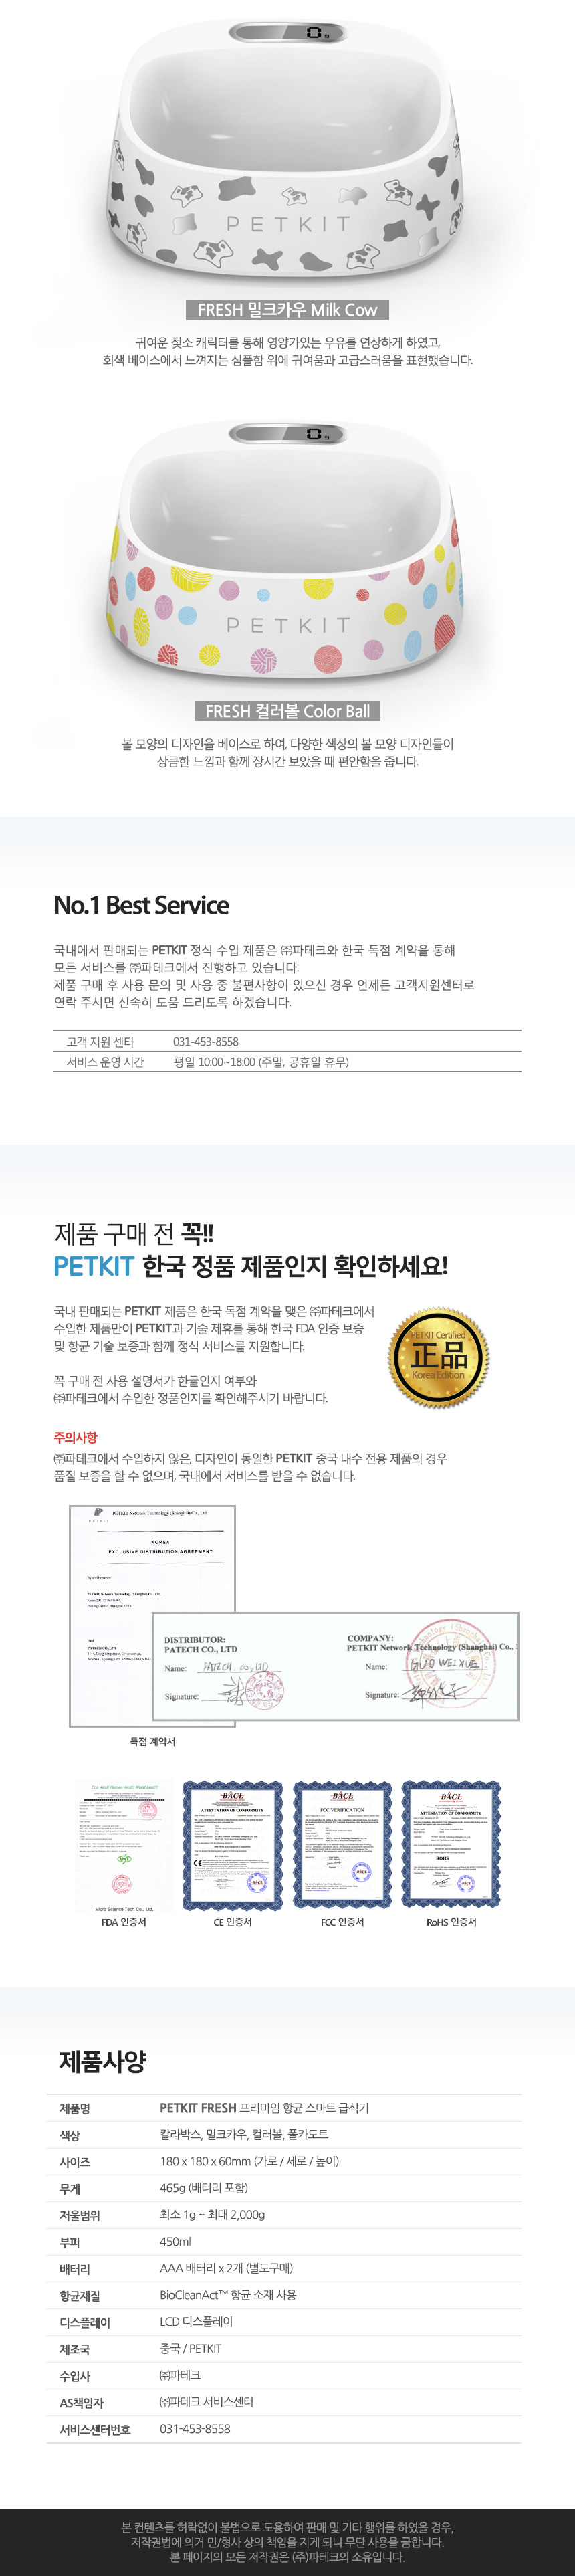 petkit_06